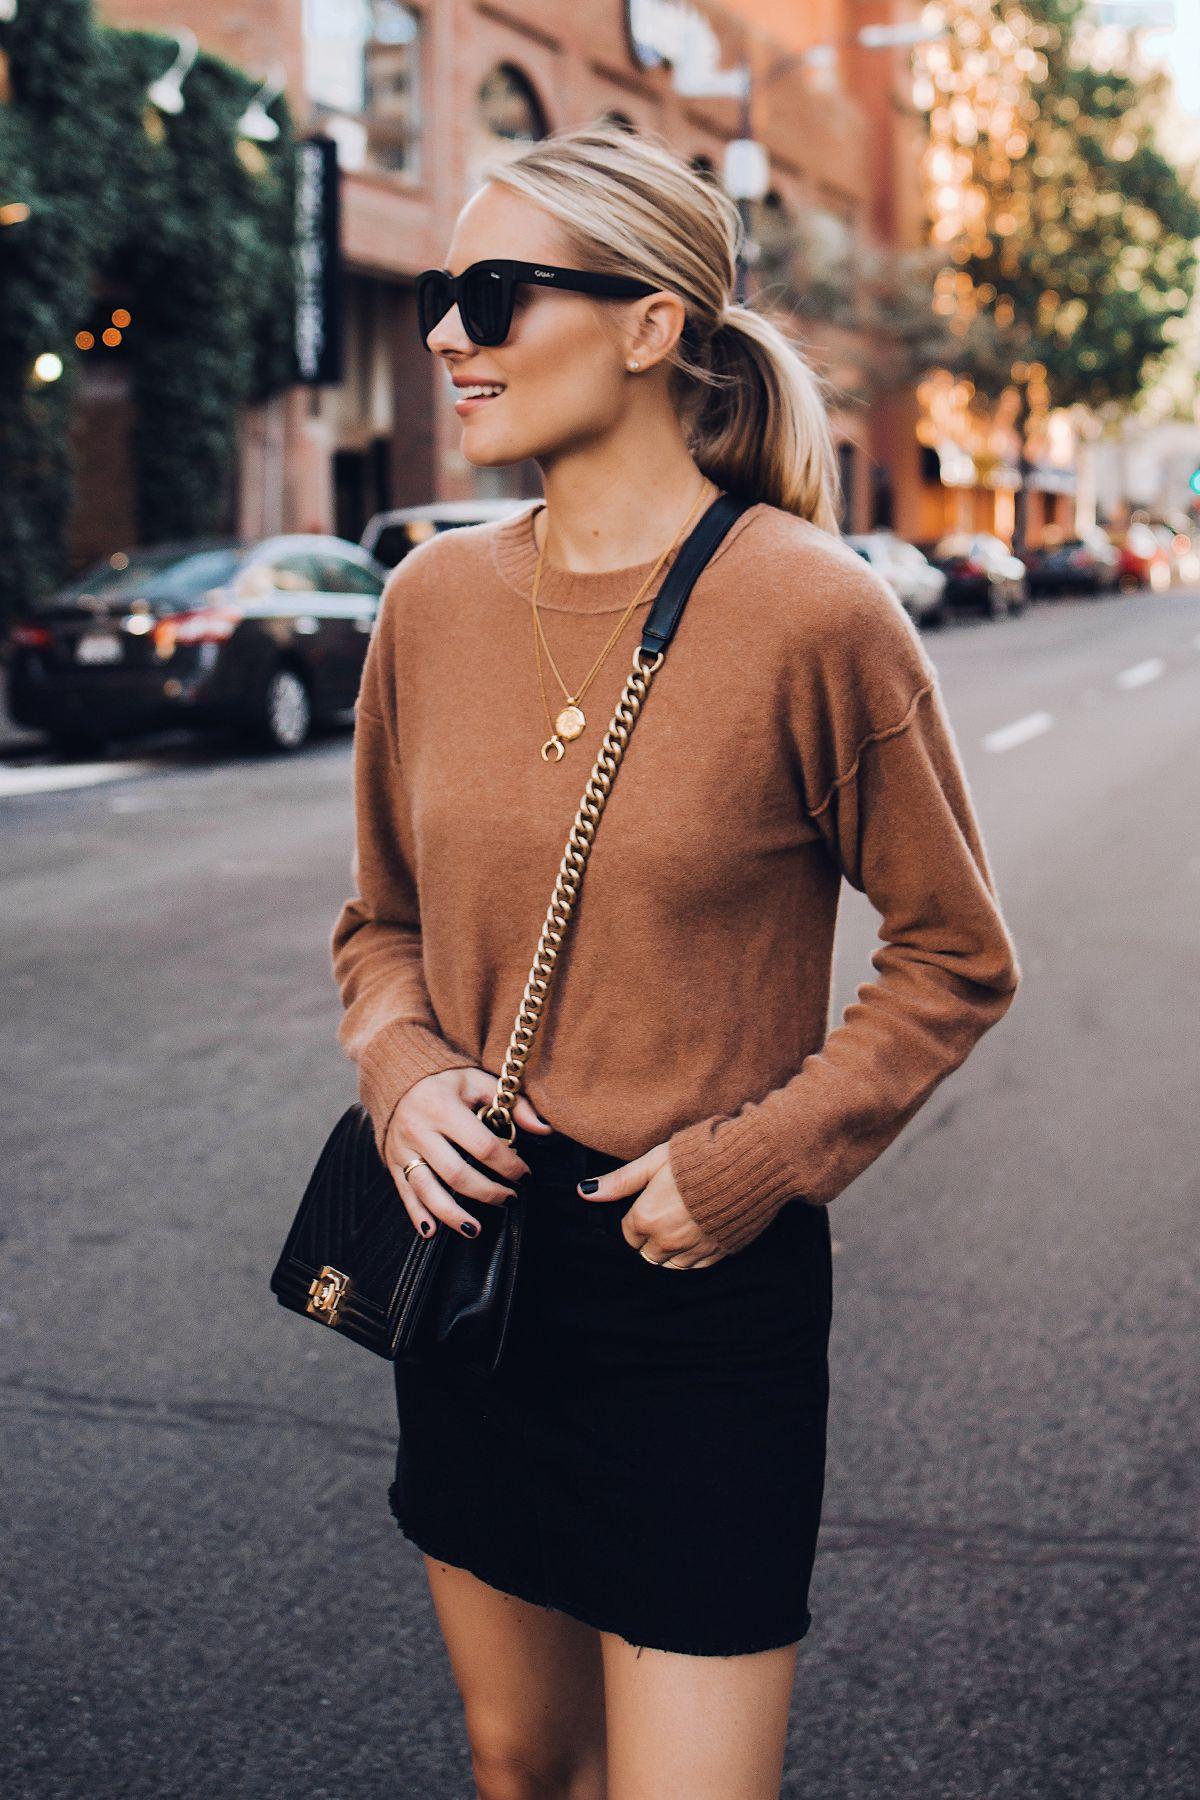 0f0f6991b5e39 Blonde Woman Wearing Free People Tan Sweater Black Denim Skirt Outfit  Chanel Black Boy Bag Fashion Jackson San Diego Fashion Blogger Street Style